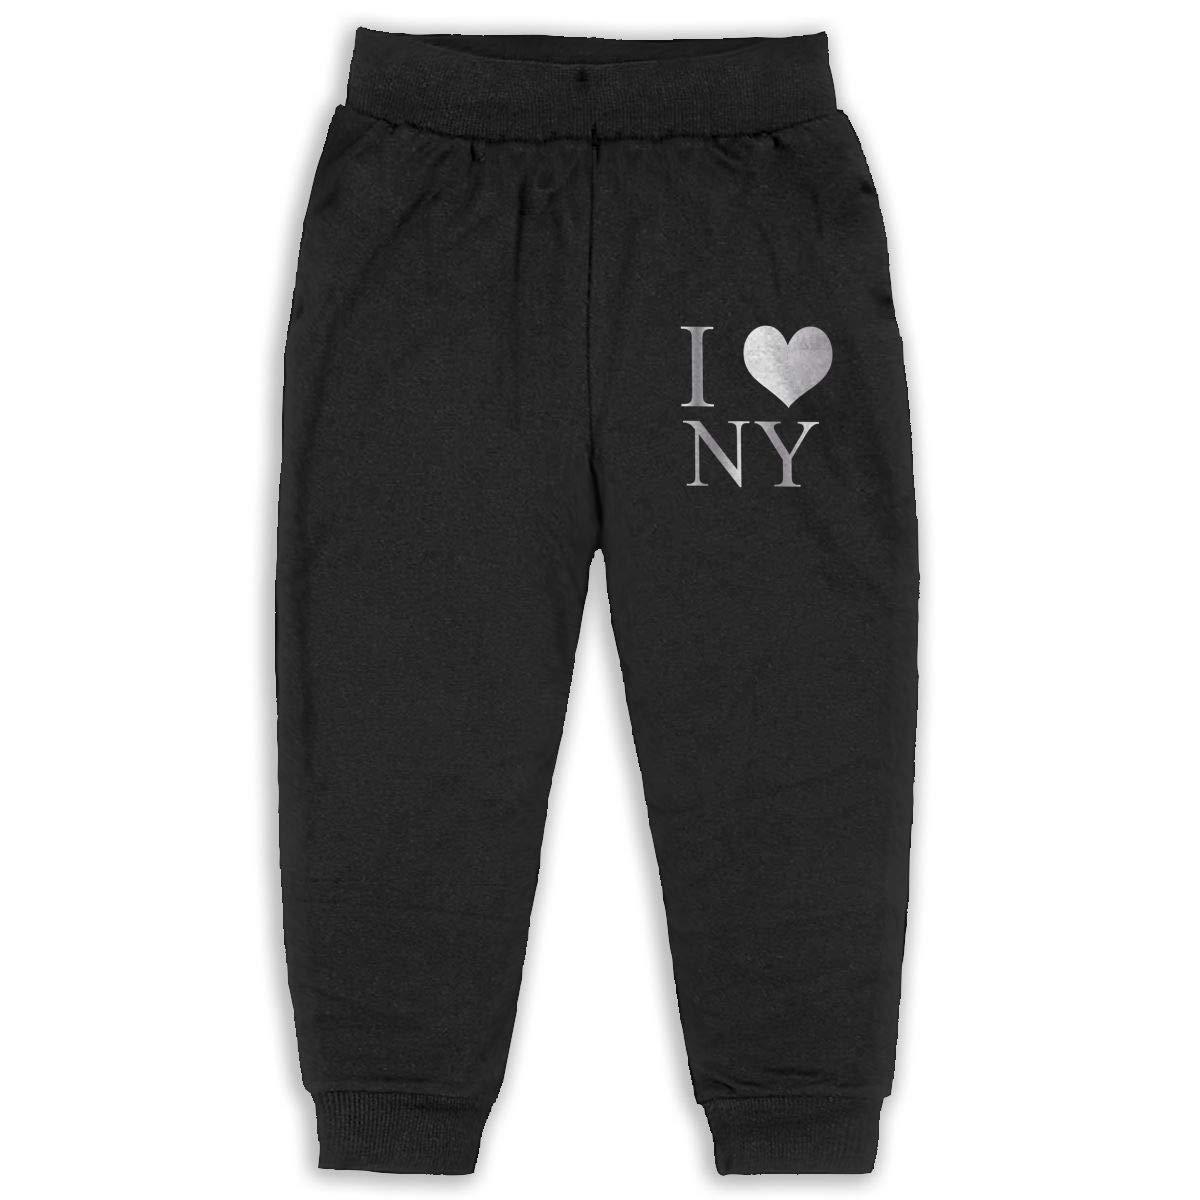 Sweatpants Love New York Pattern Cotton Toddler Active Jogger Full-Length Regular Size Pants Kids